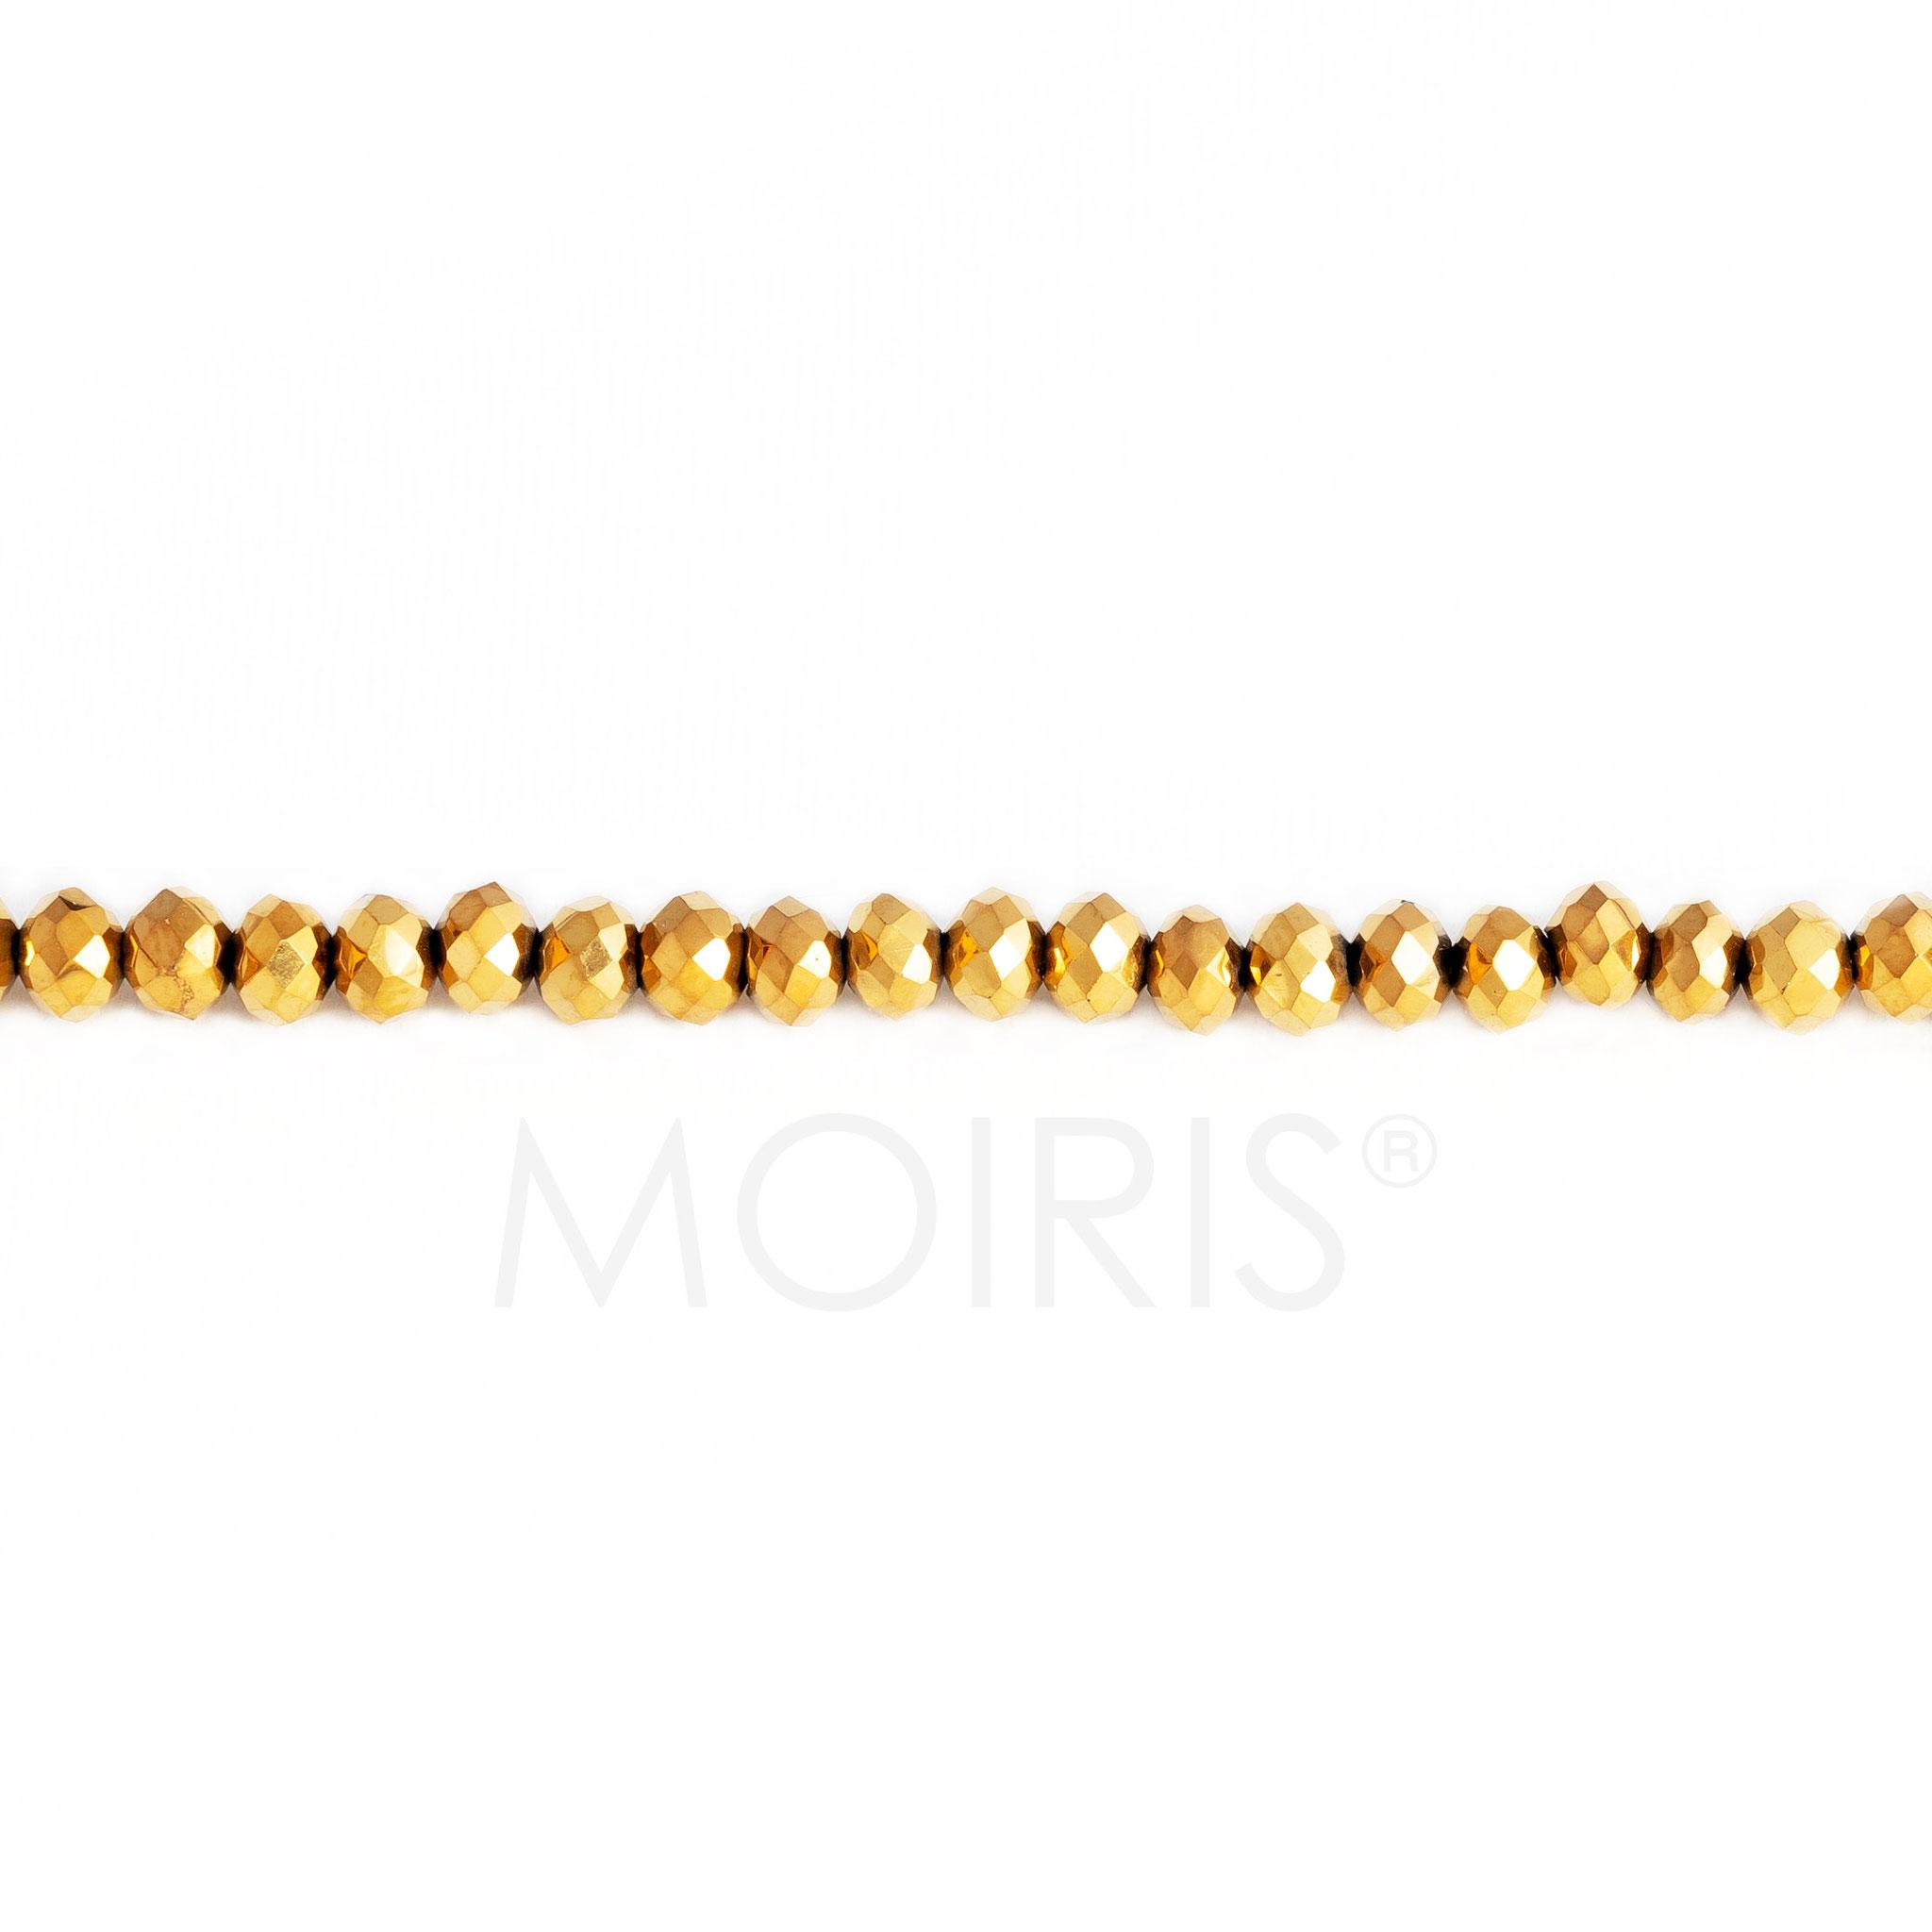 BH-Schmuckträger Scarlett Gold 4mm